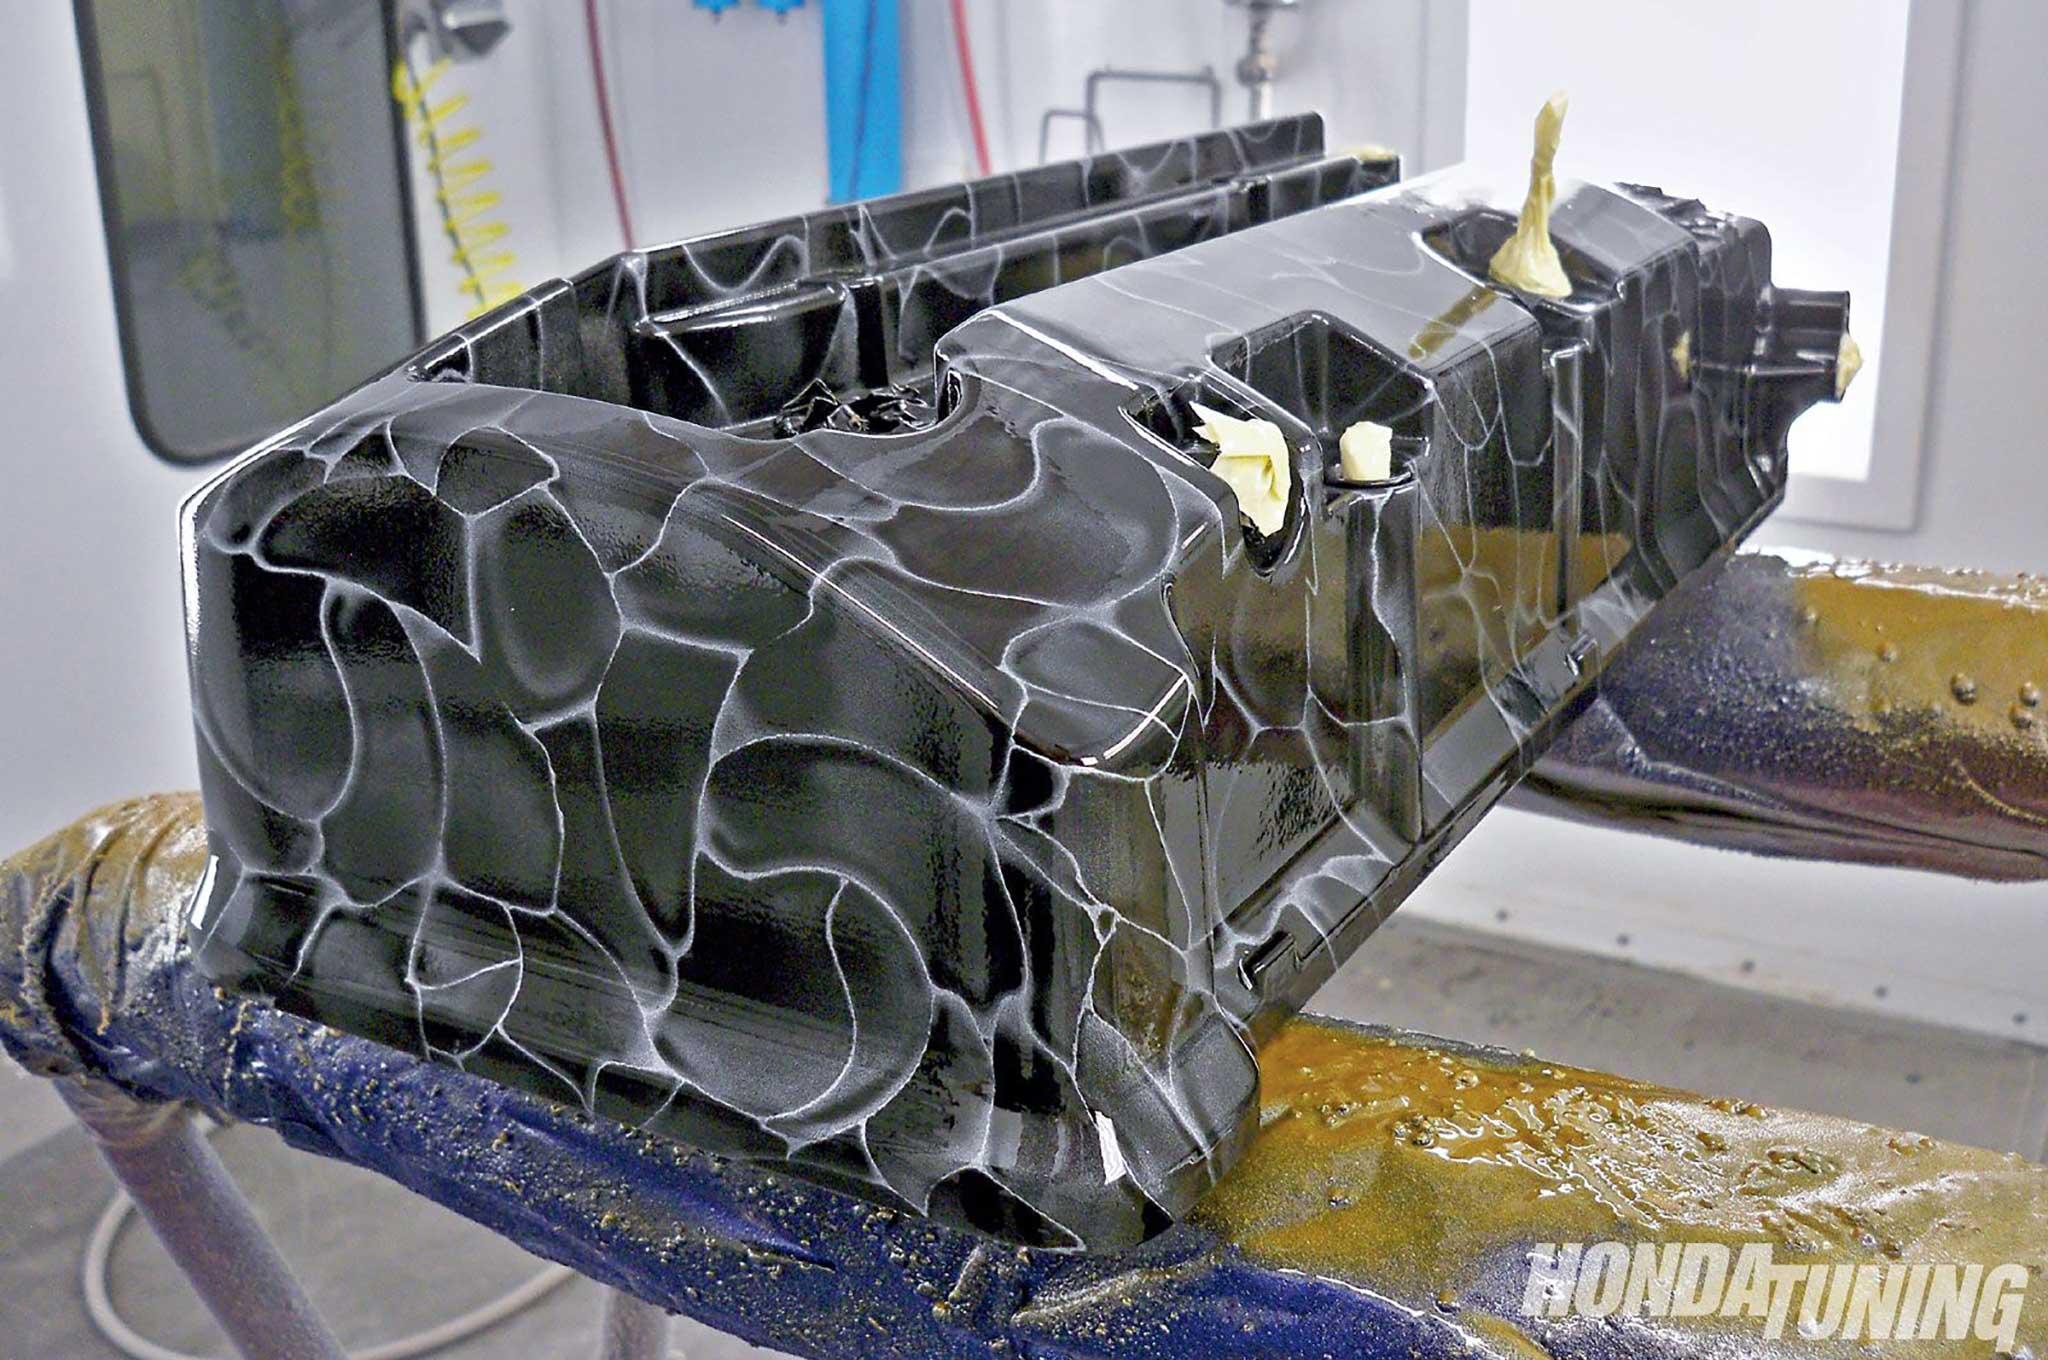 OHW's Hydrographics DIY Kit